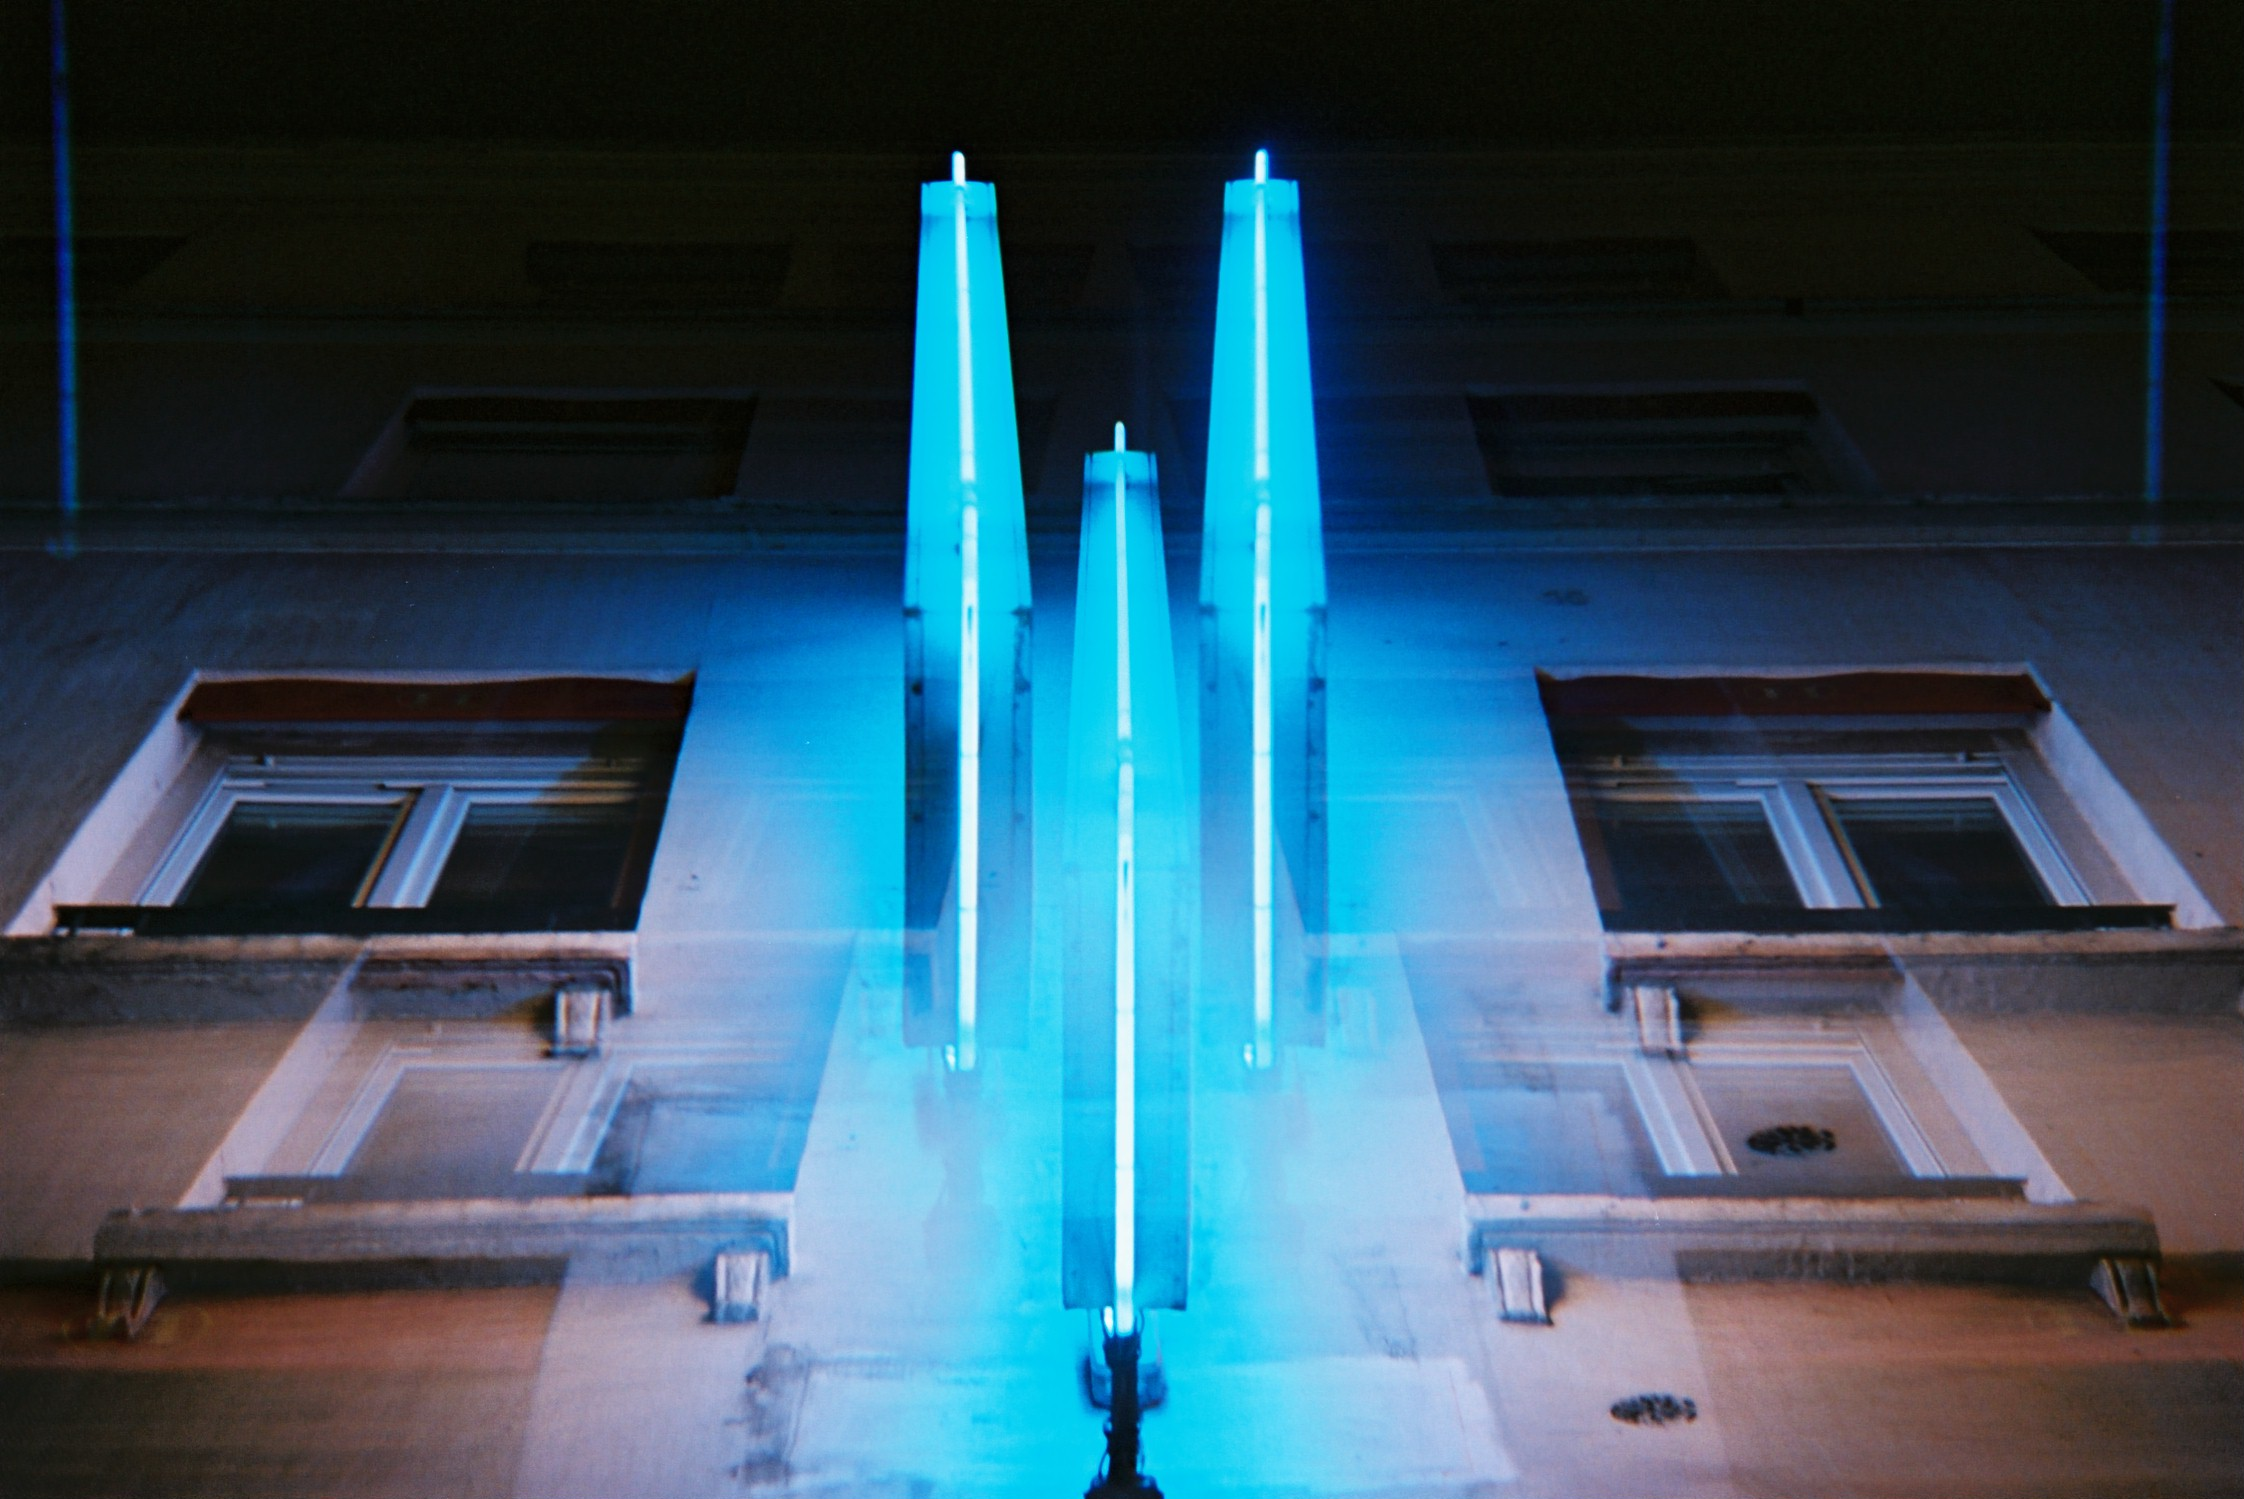 alexis dubourdieu - blue - invisible serie.JPG